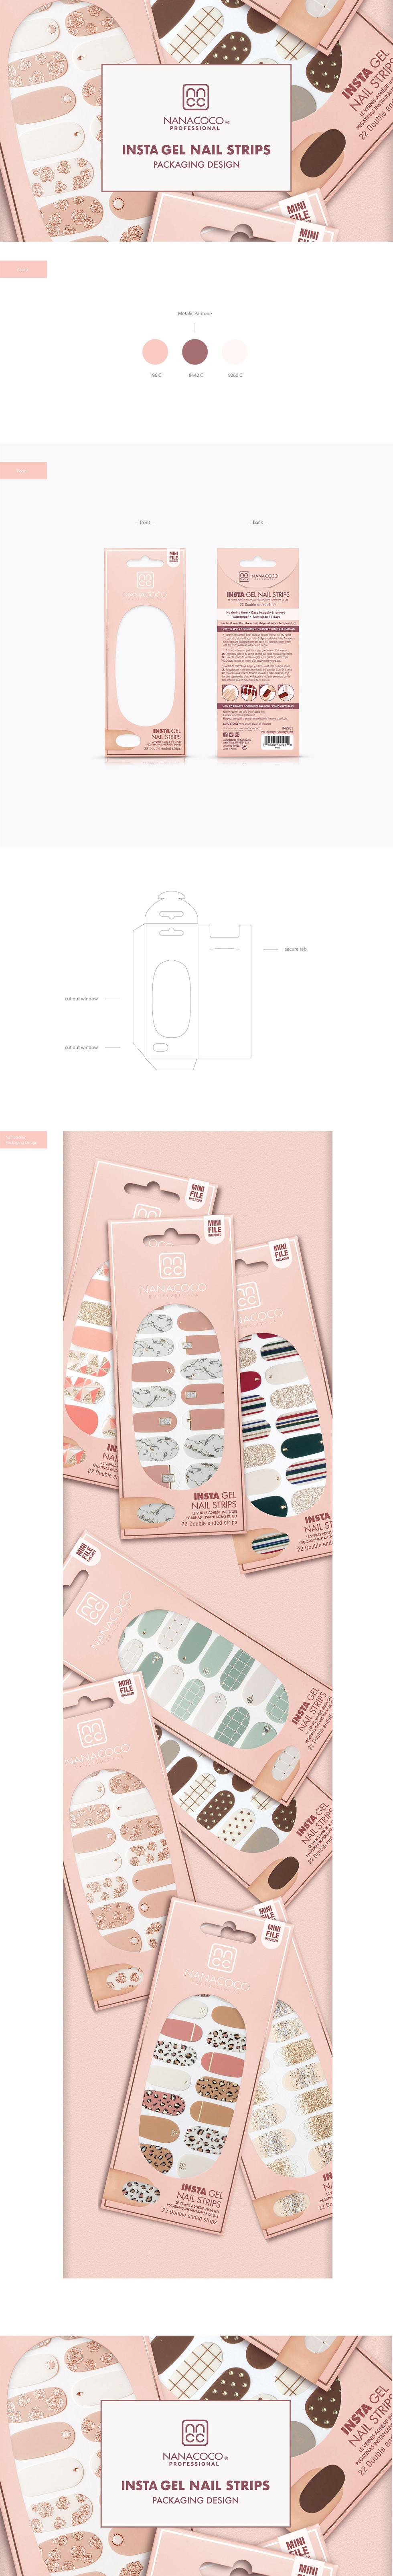 nail sticker.jpg